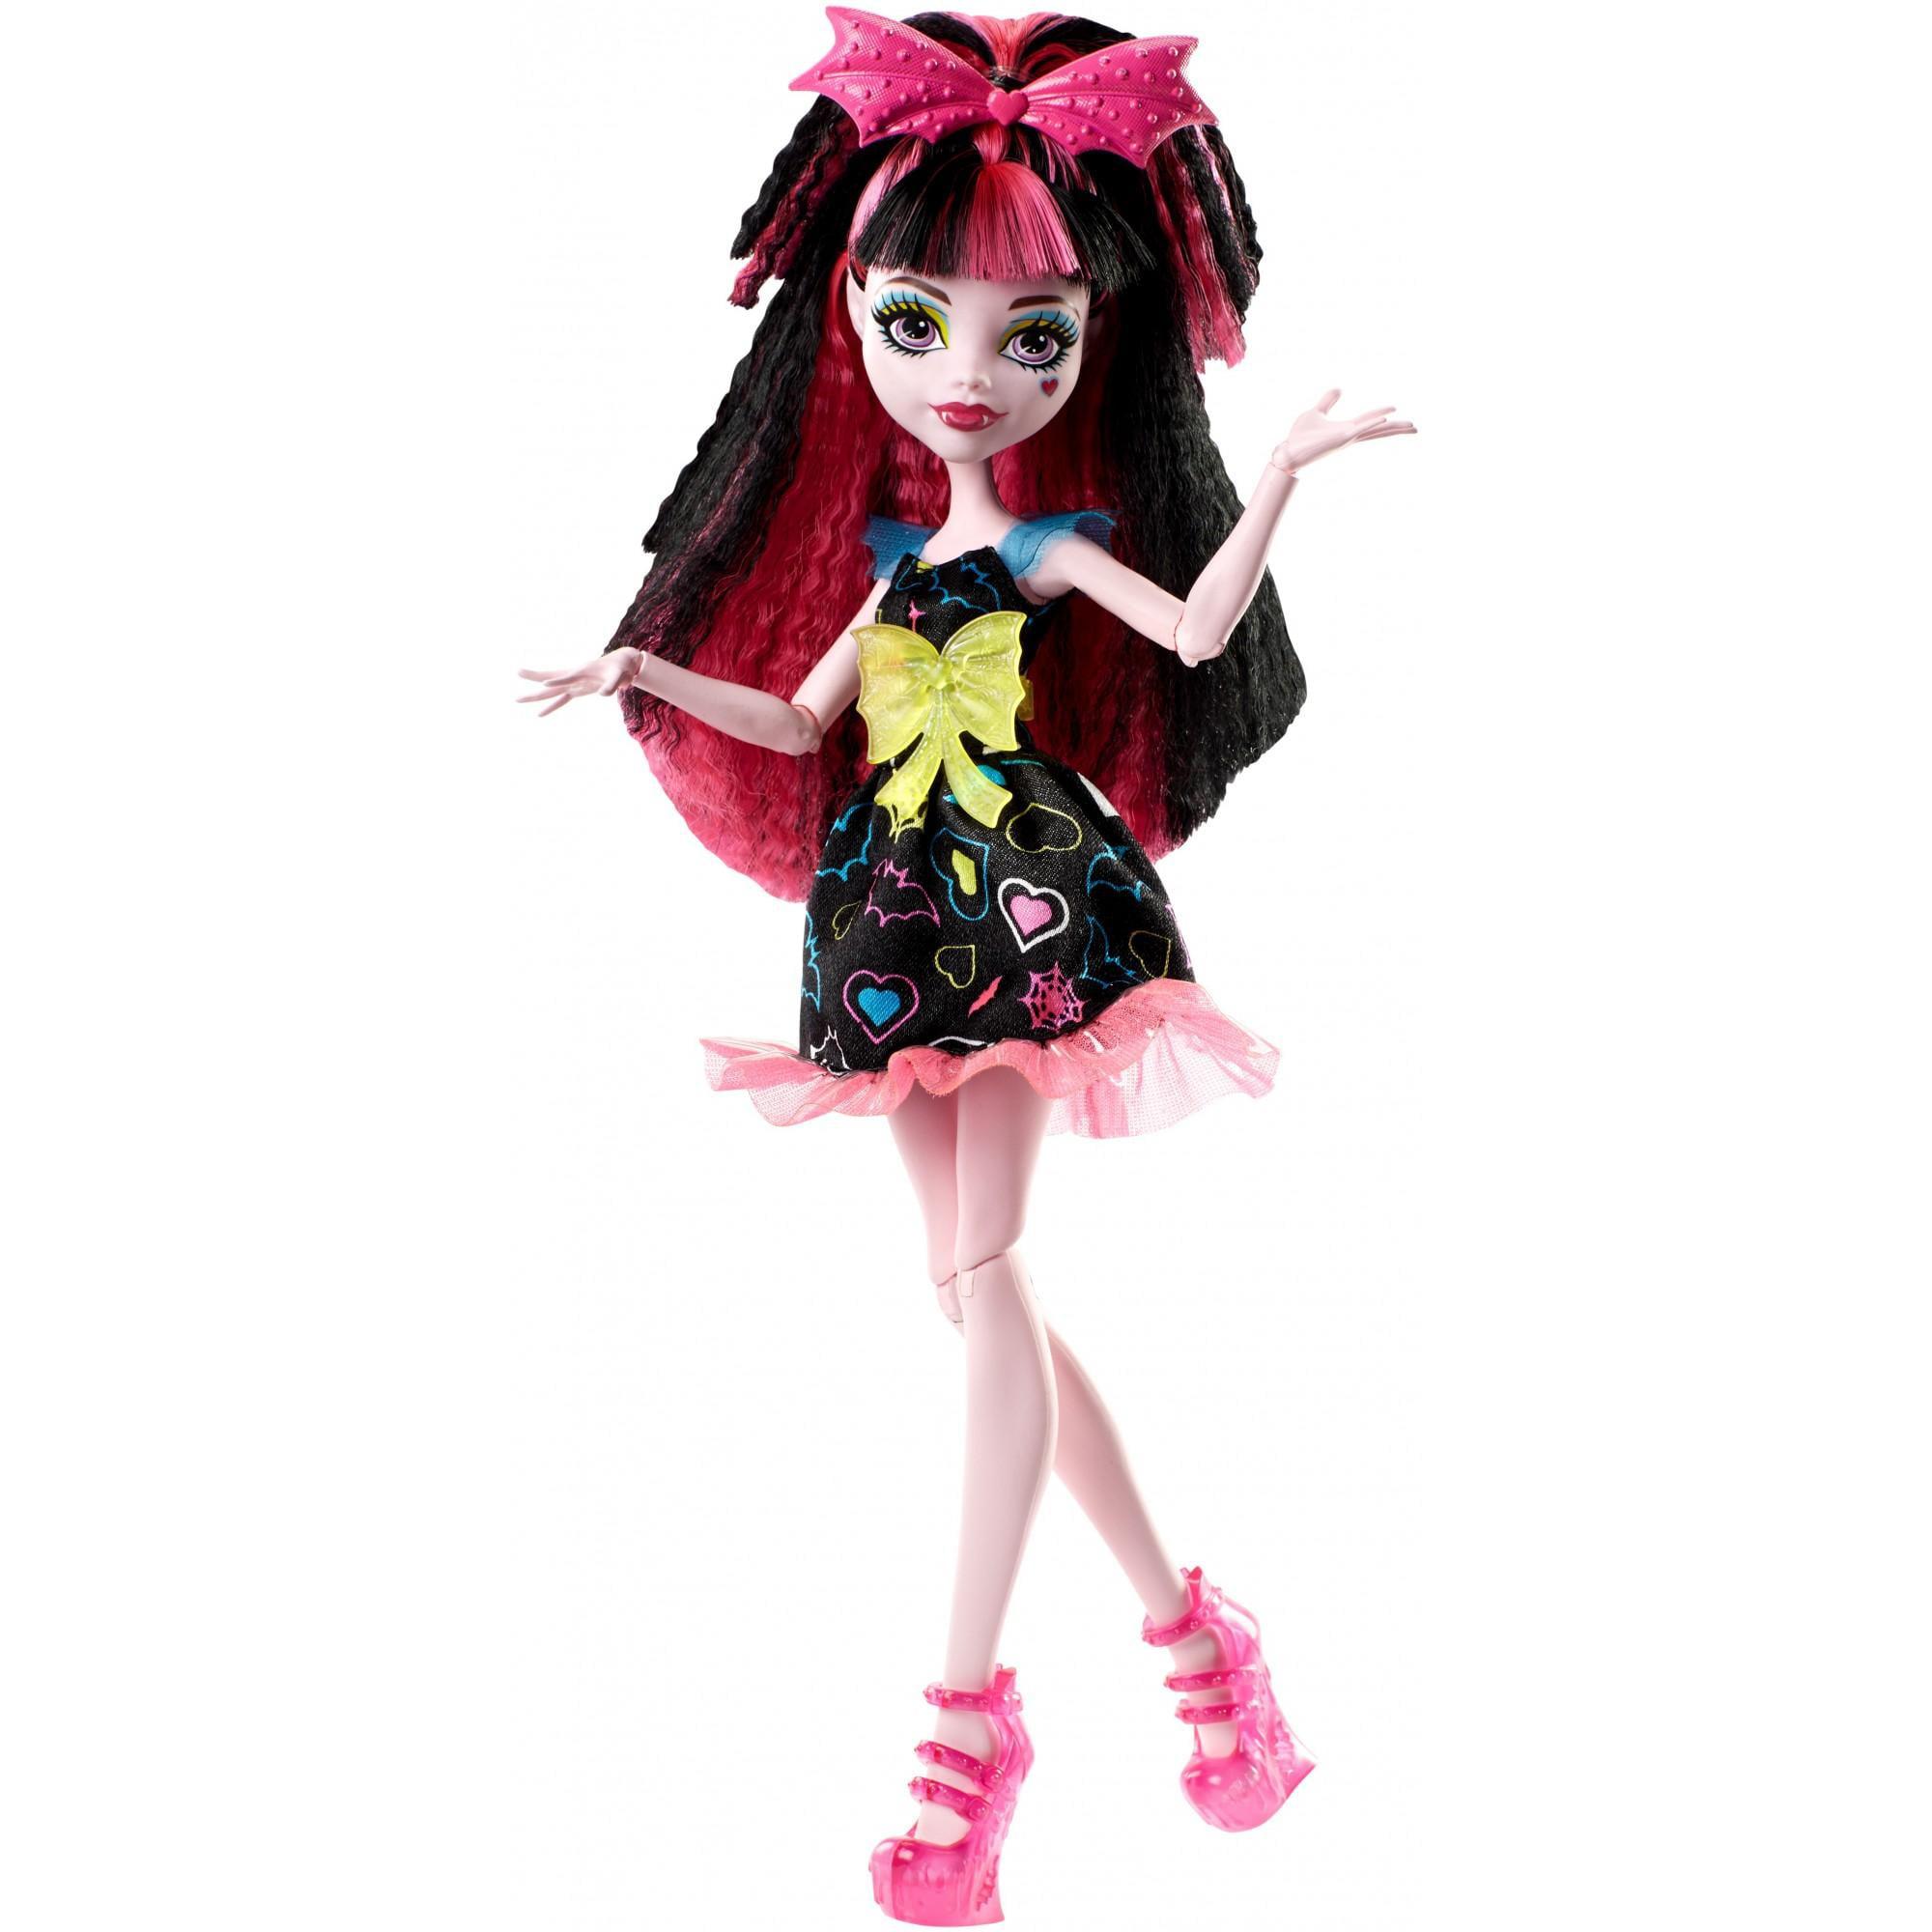 Monster High Electrified Hair-Raising Ghouls Draculaura Doll by MATTEL INC.